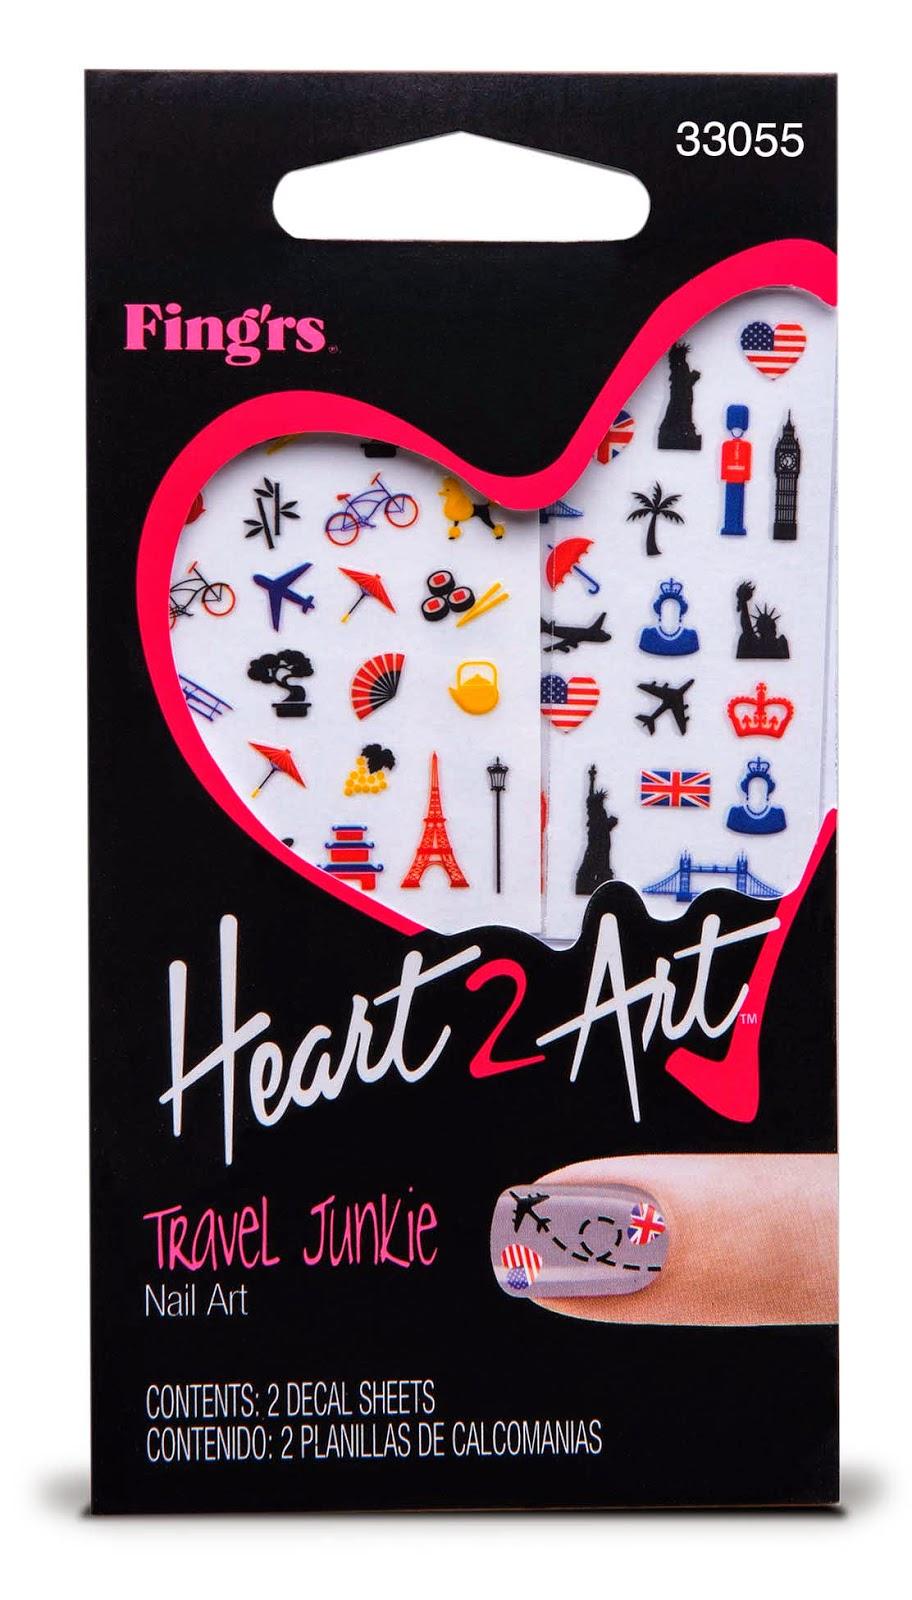 Heart2Art - Travel Junkie